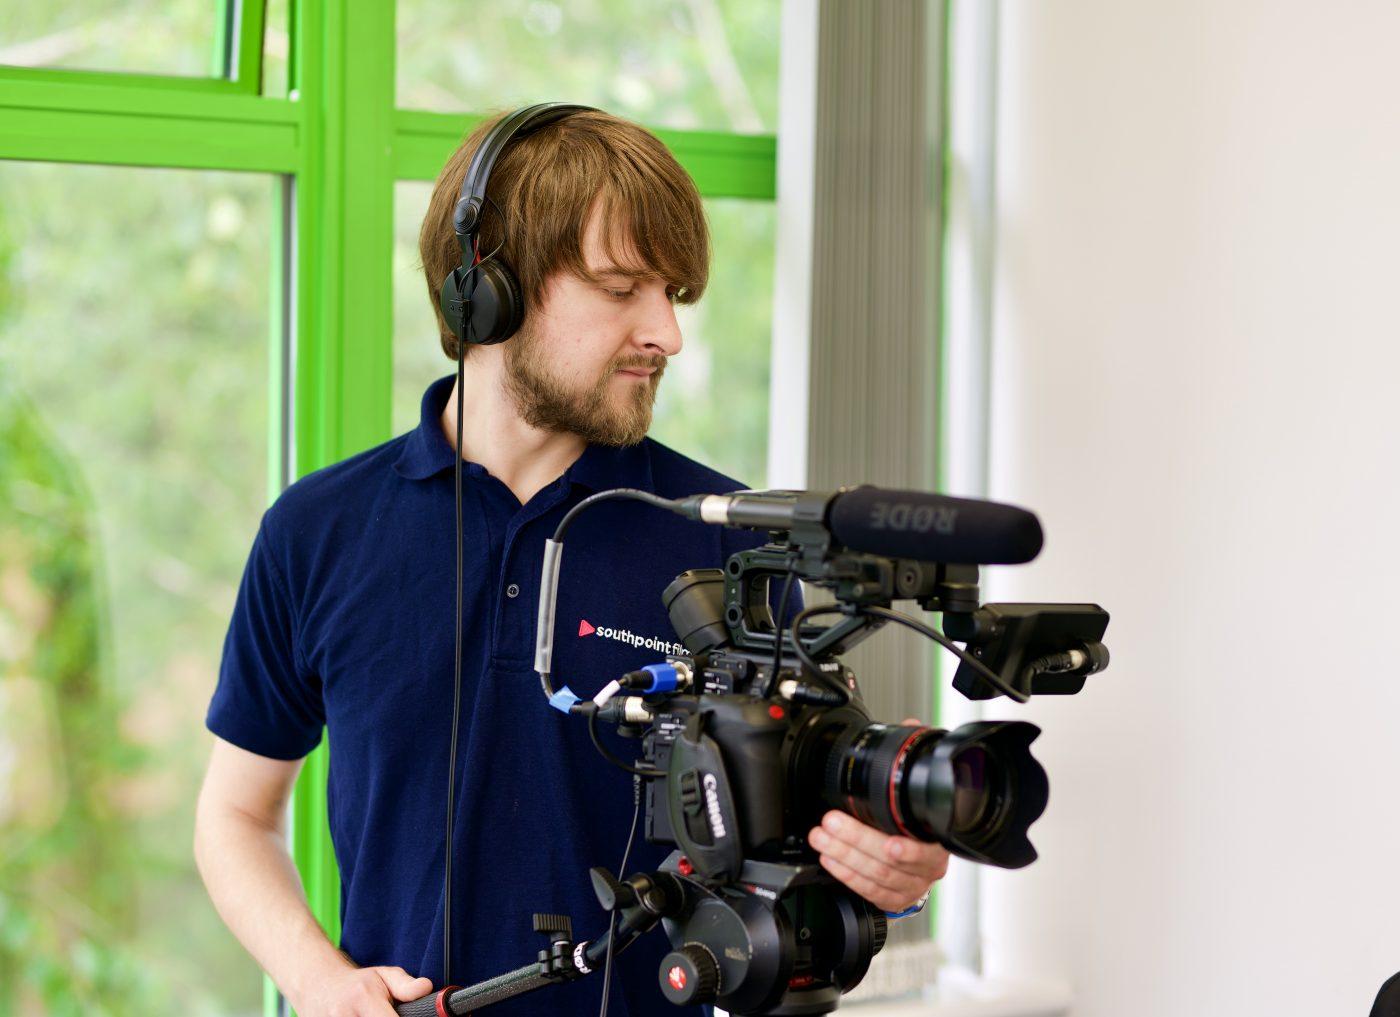 Rowan Johnson filming for Europump in June 2020